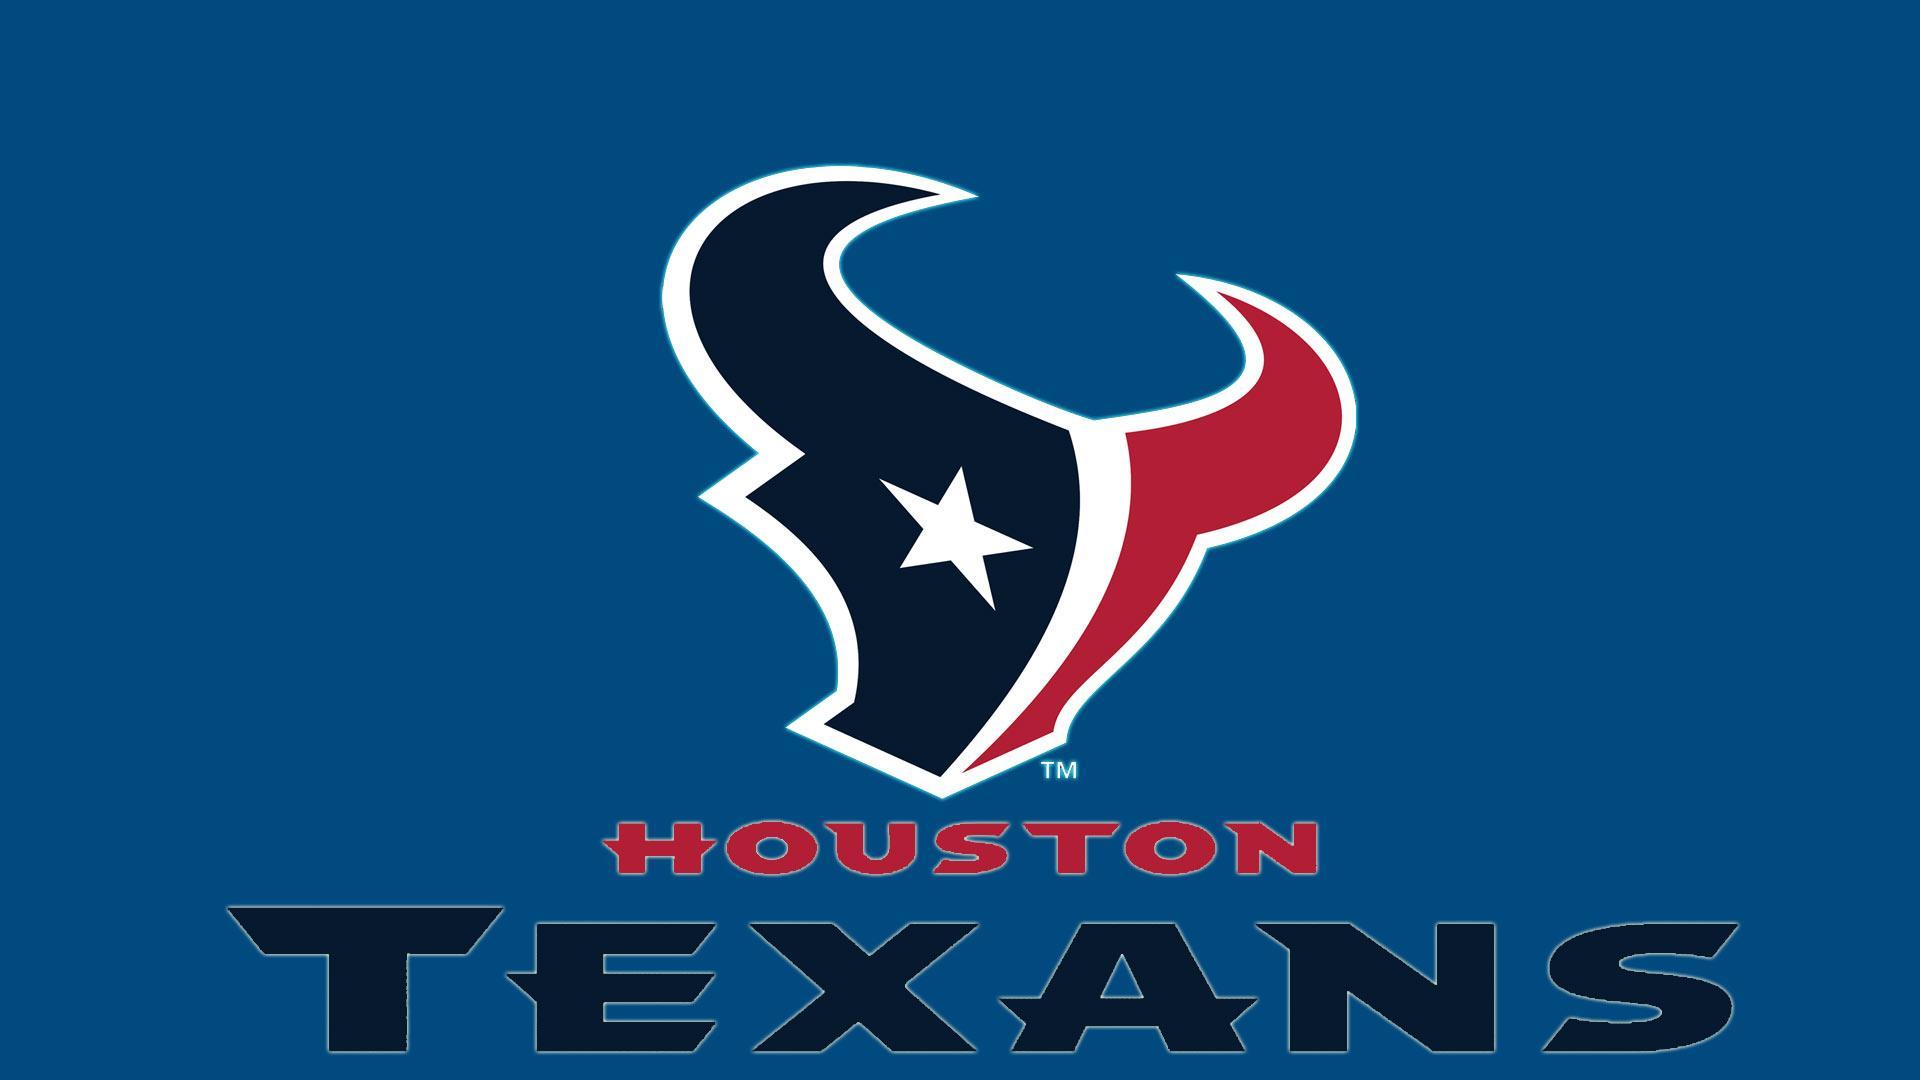 Texans Logo Hd 1080p Wallpaper Screen Size 19201080 HD Wallpapers 1920x1080